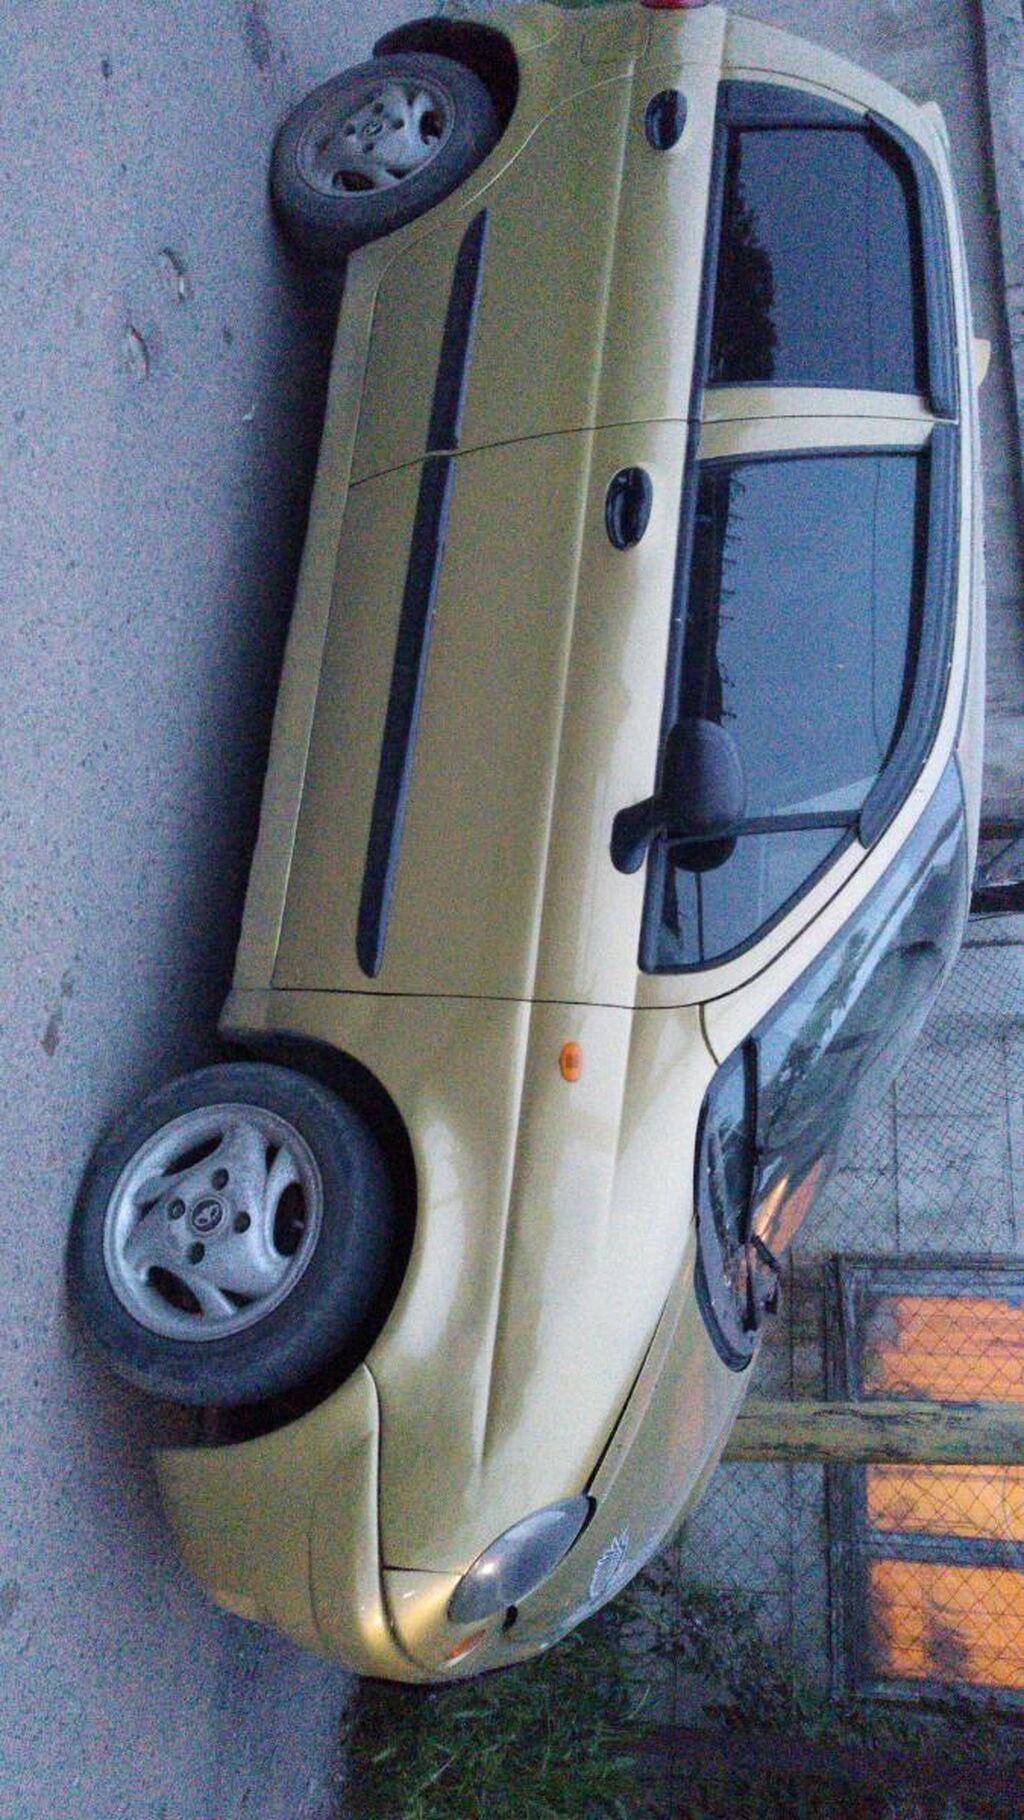 Daewoo Matiz 0.8 л